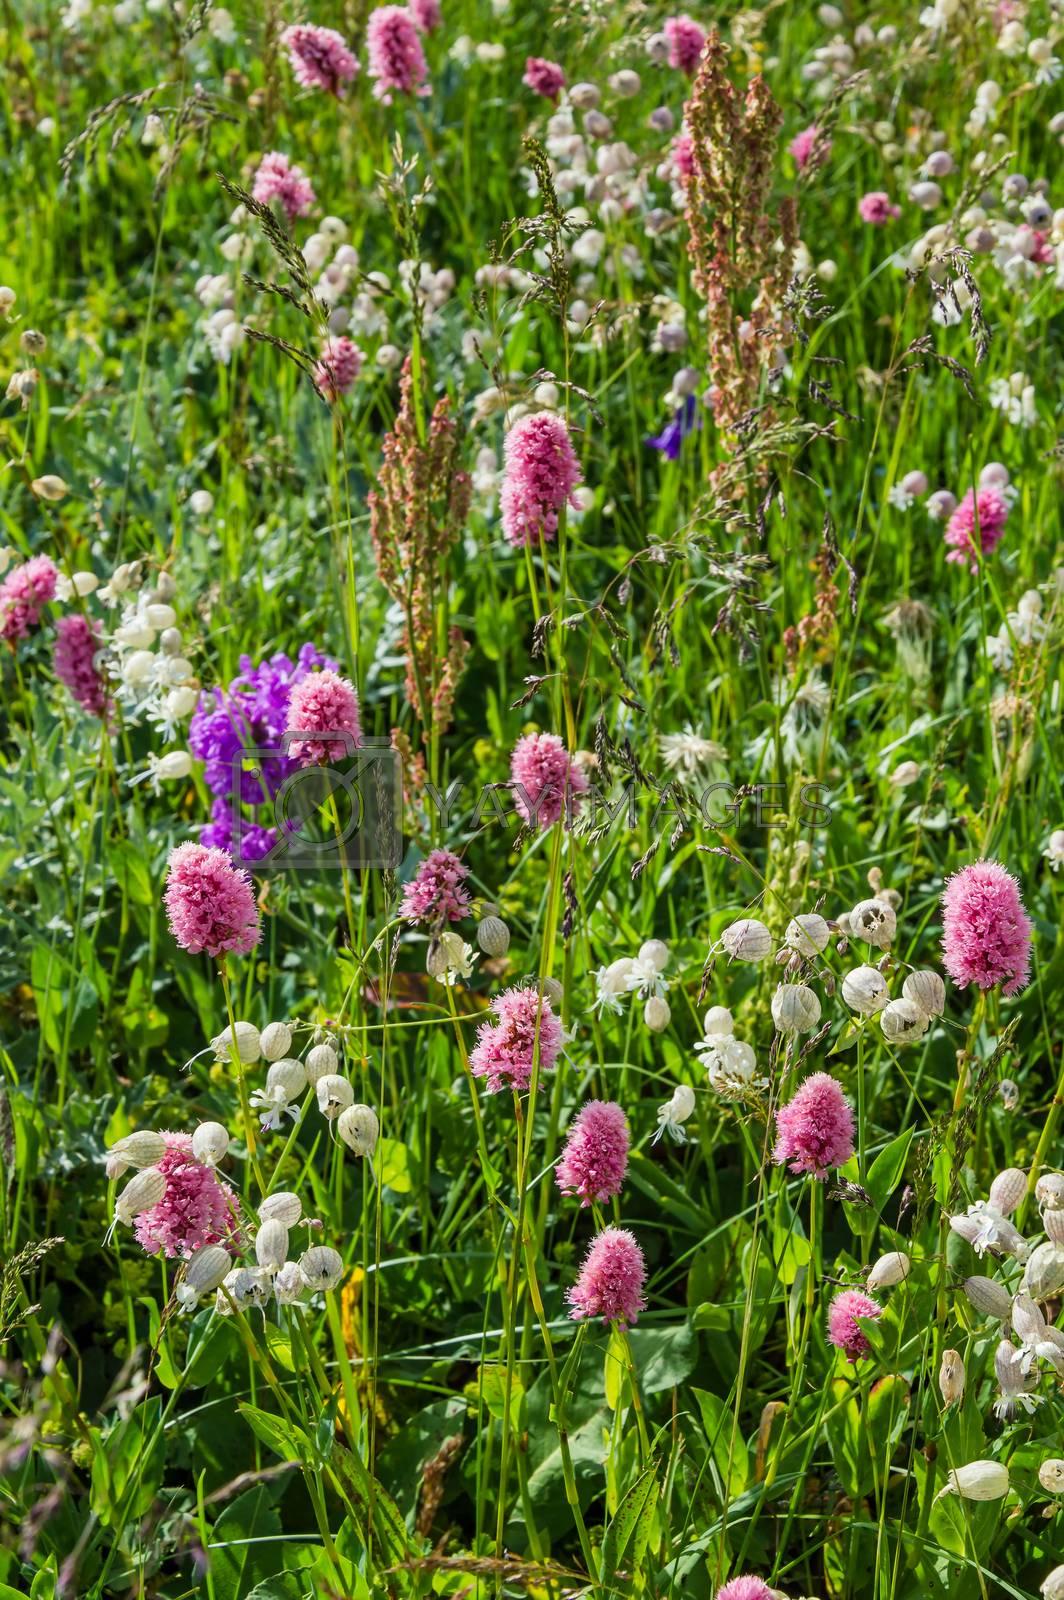 Royalty free image of Flower meadow by firewings